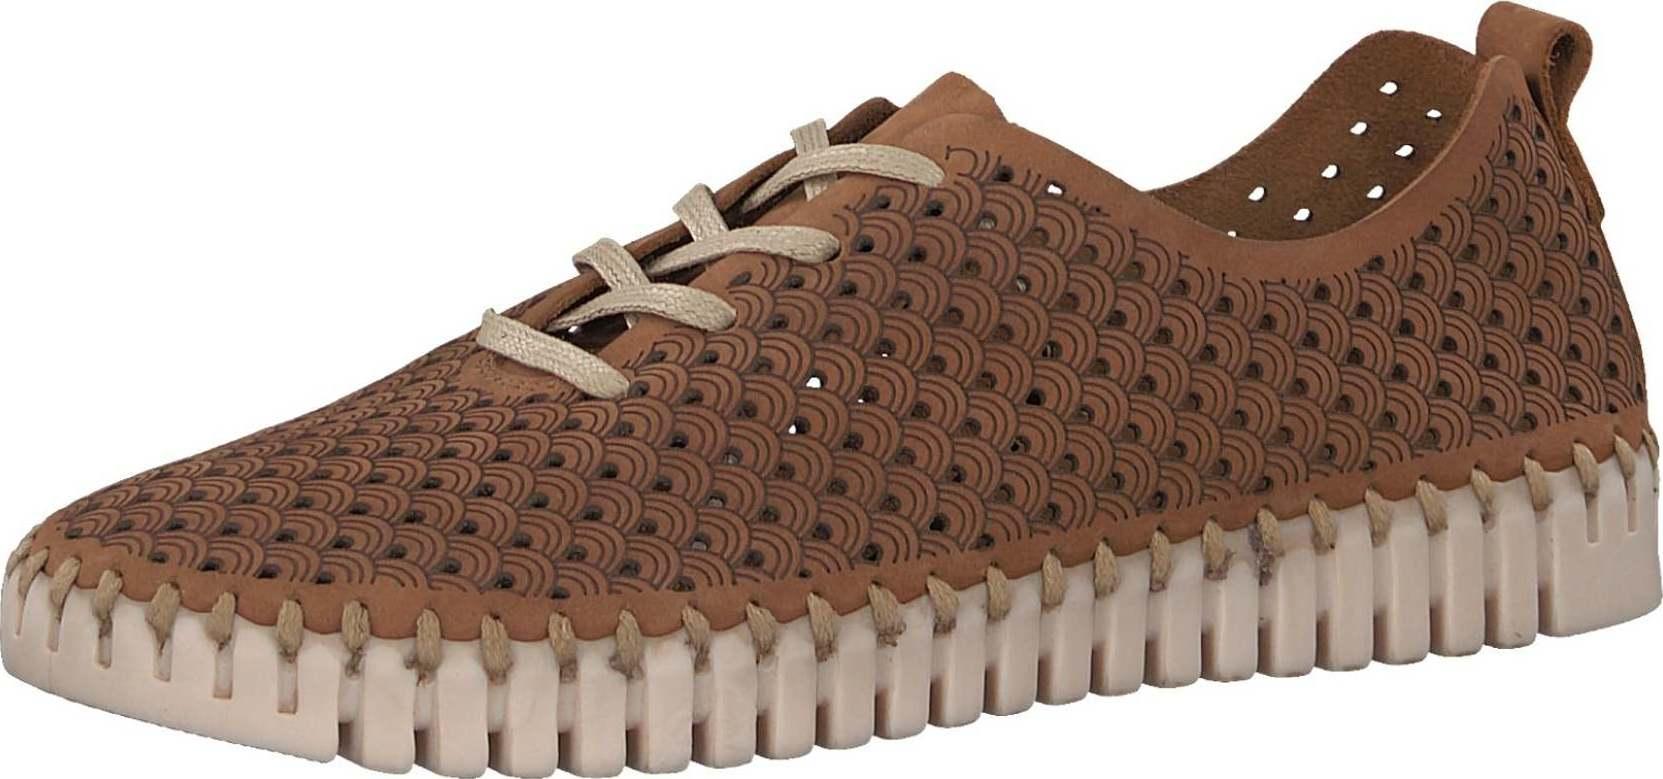 929e80f809 Dámská obuv TAMARIS 1-1-23618-20 COGNAC 305 – BOTY RIEKER